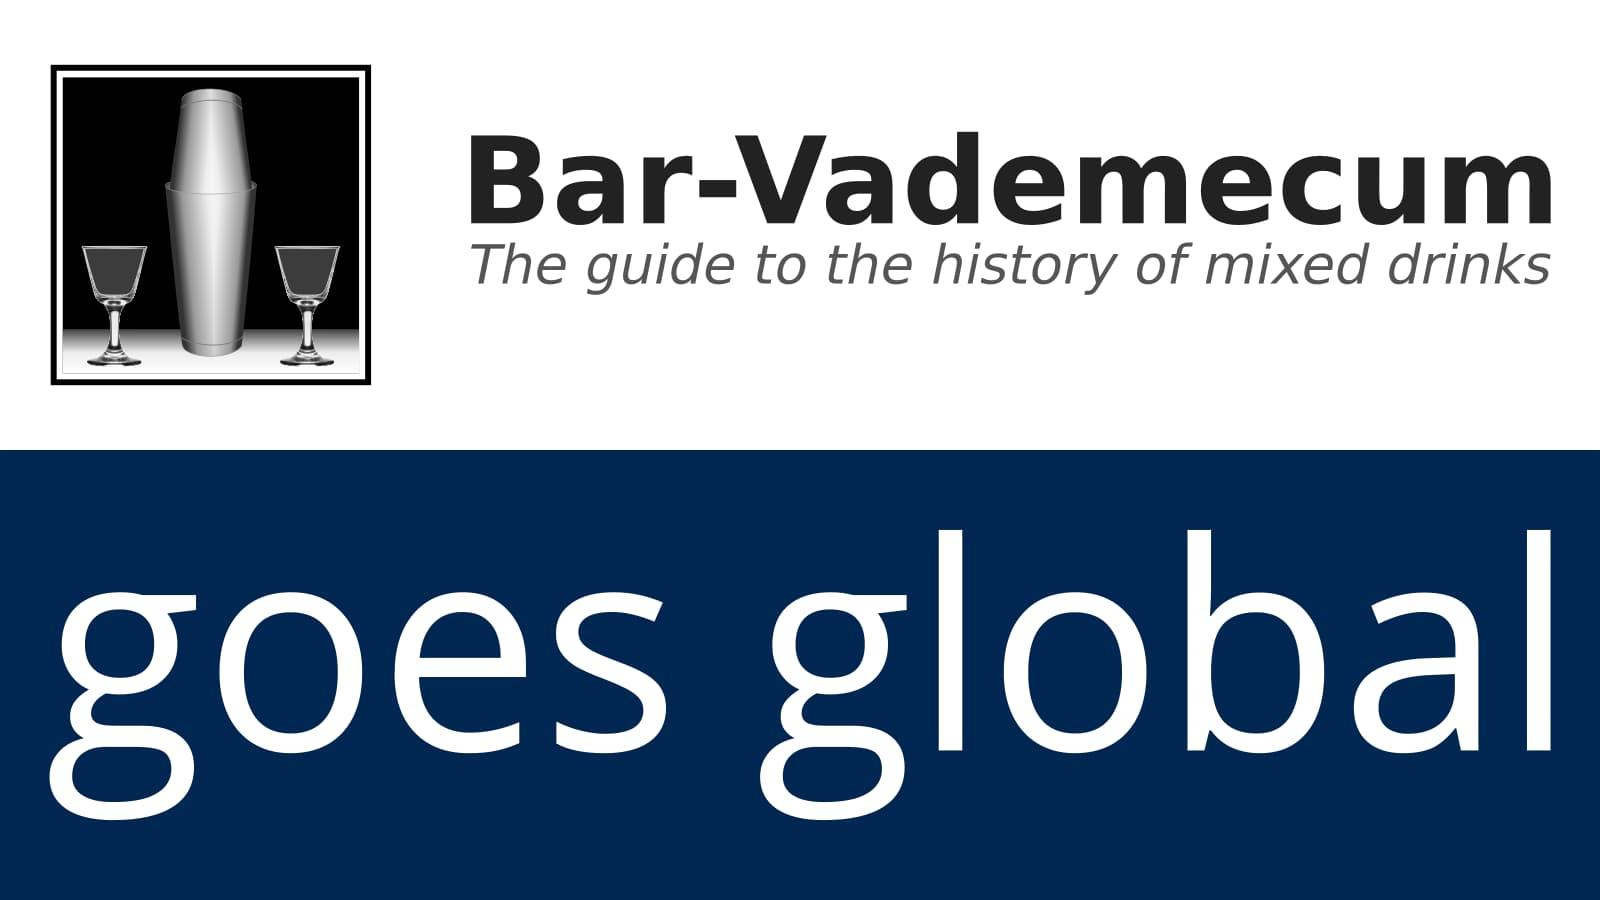 Bar-Vademecum goes global